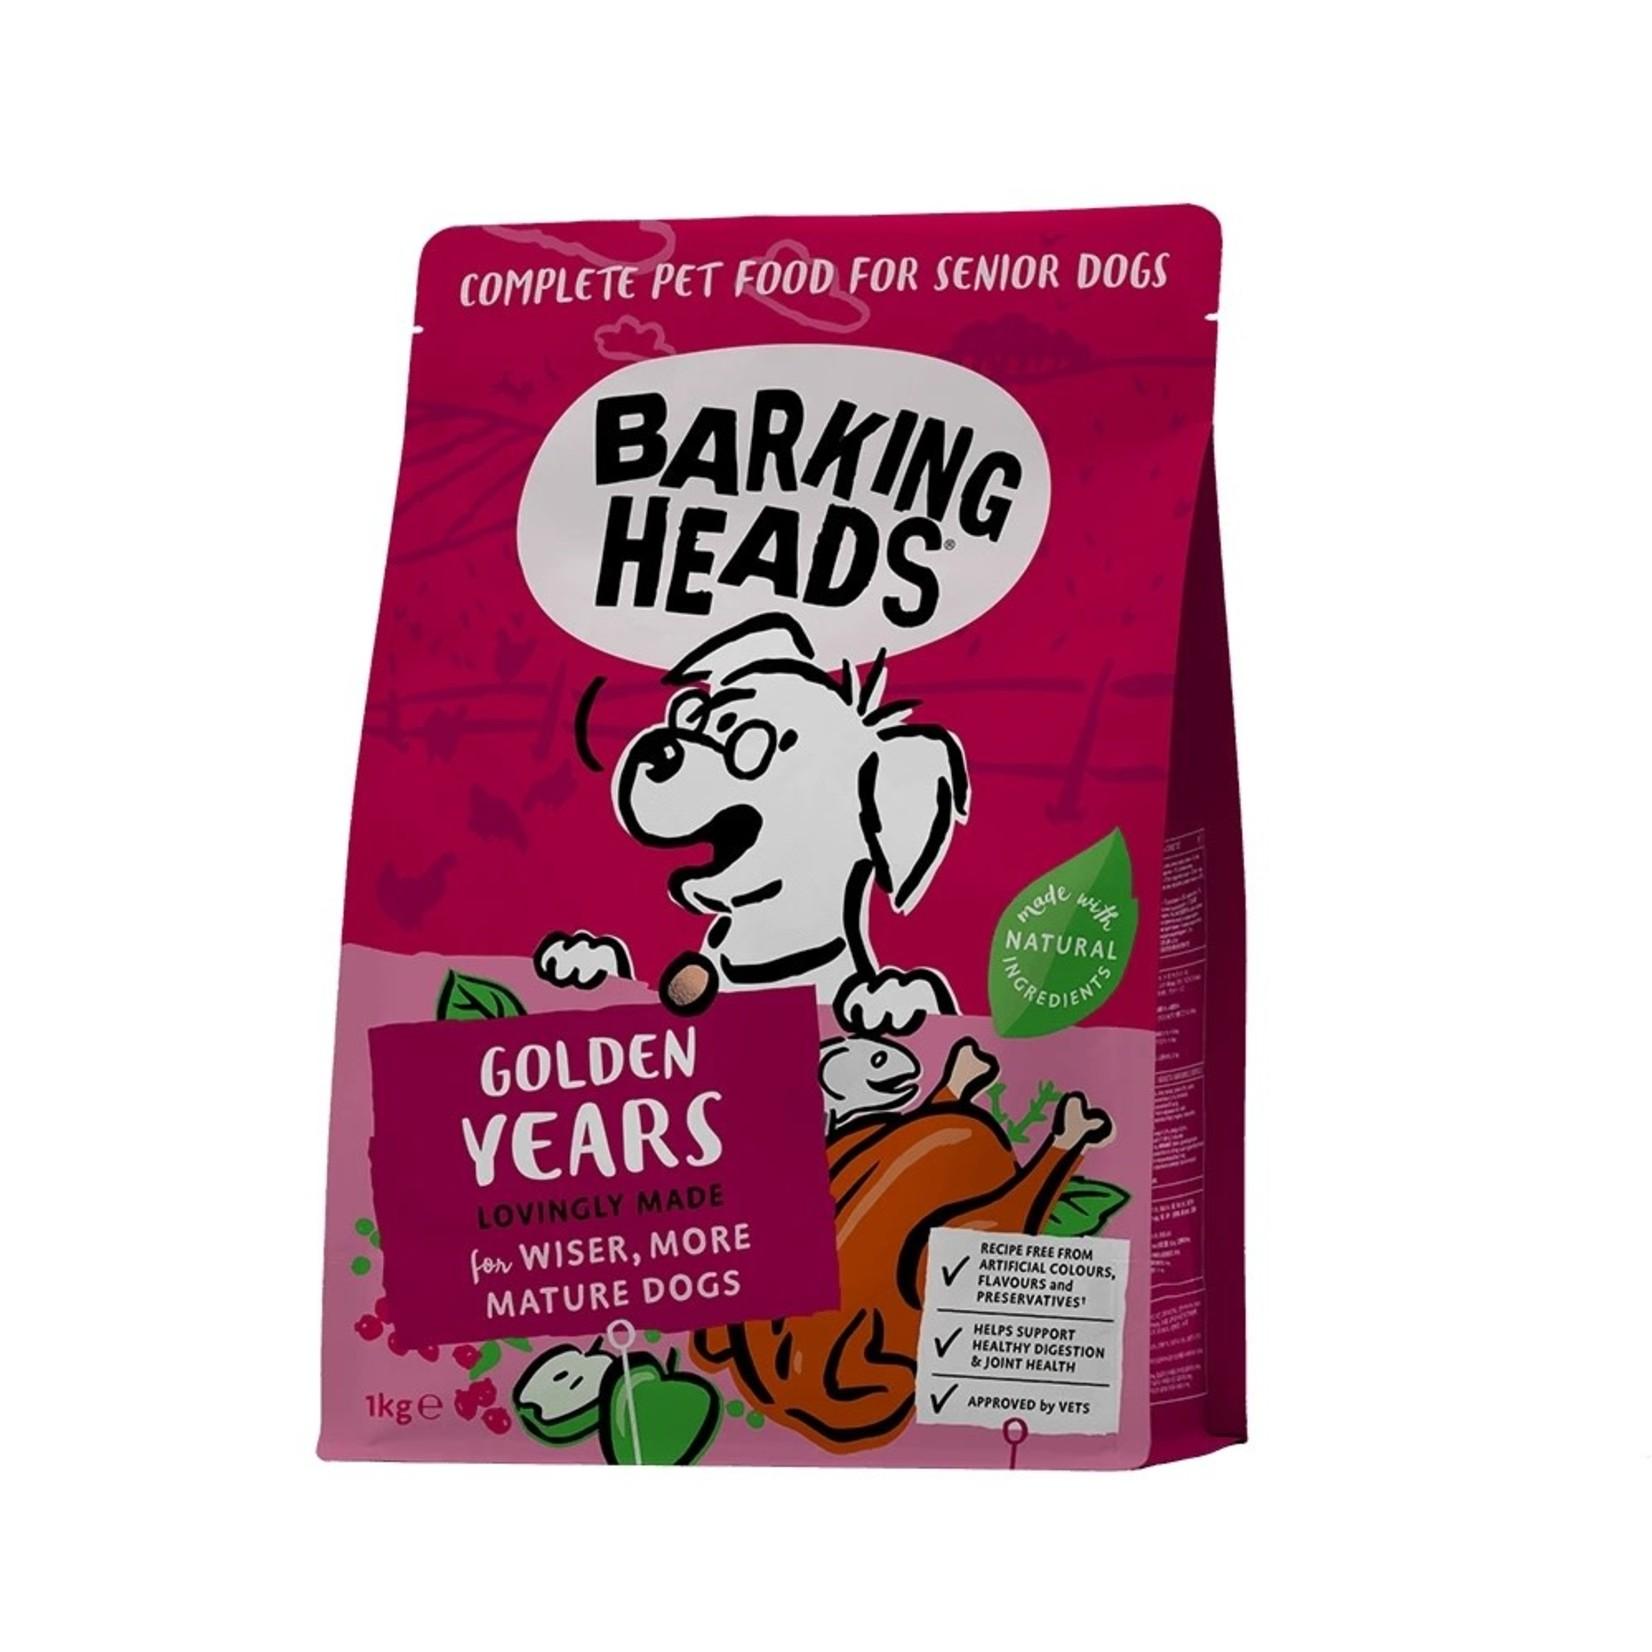 Barking Heads Golden Years Senior Dry Dog Food, Chicken & Salmon